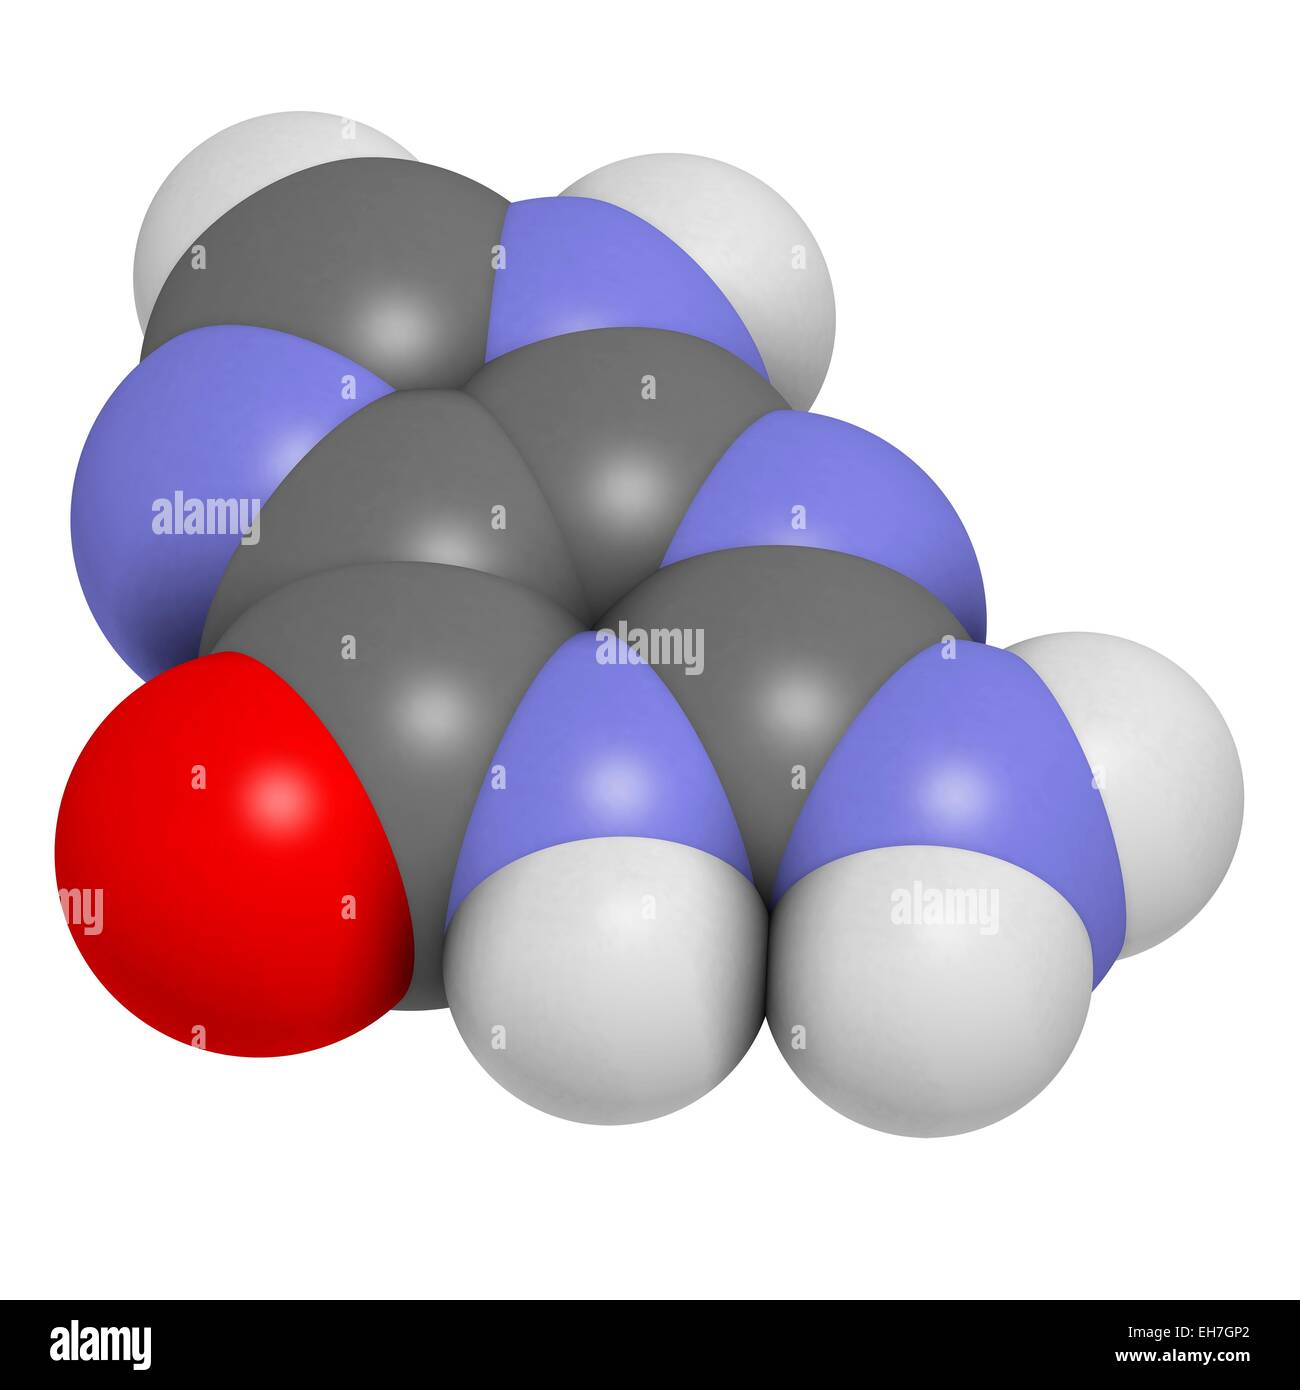 Guanine purine nucleobase molecule - Stock Image